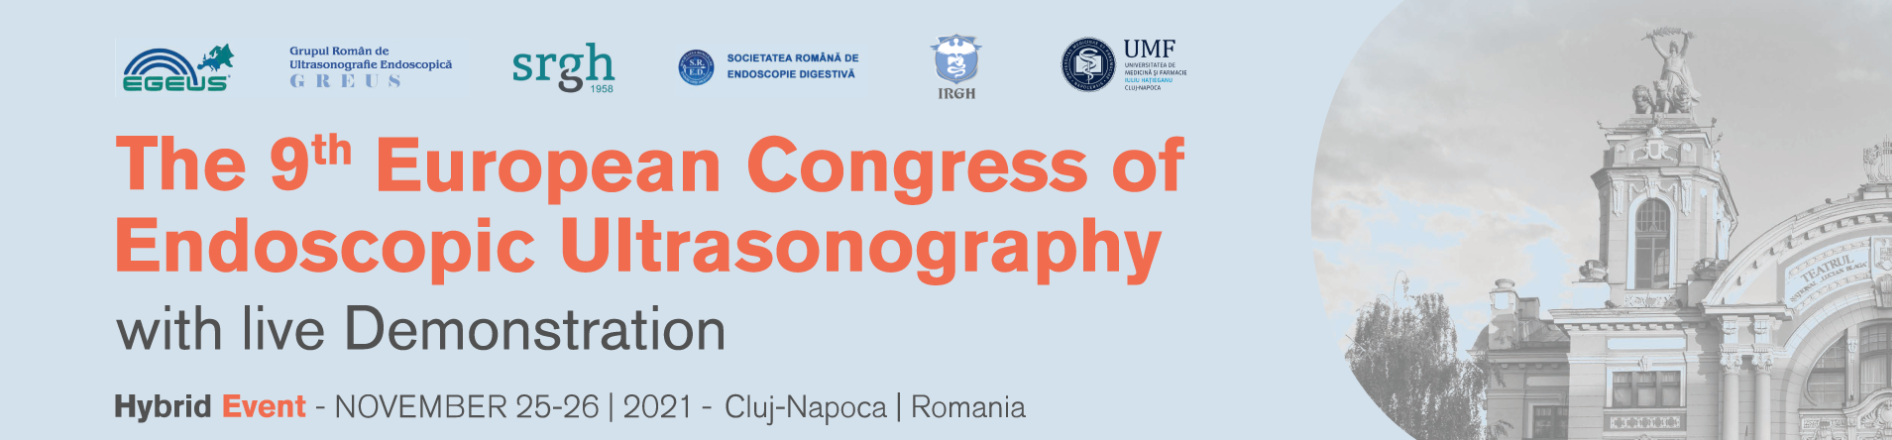 The 9th European Congress of Endoscopic Ultrasonography